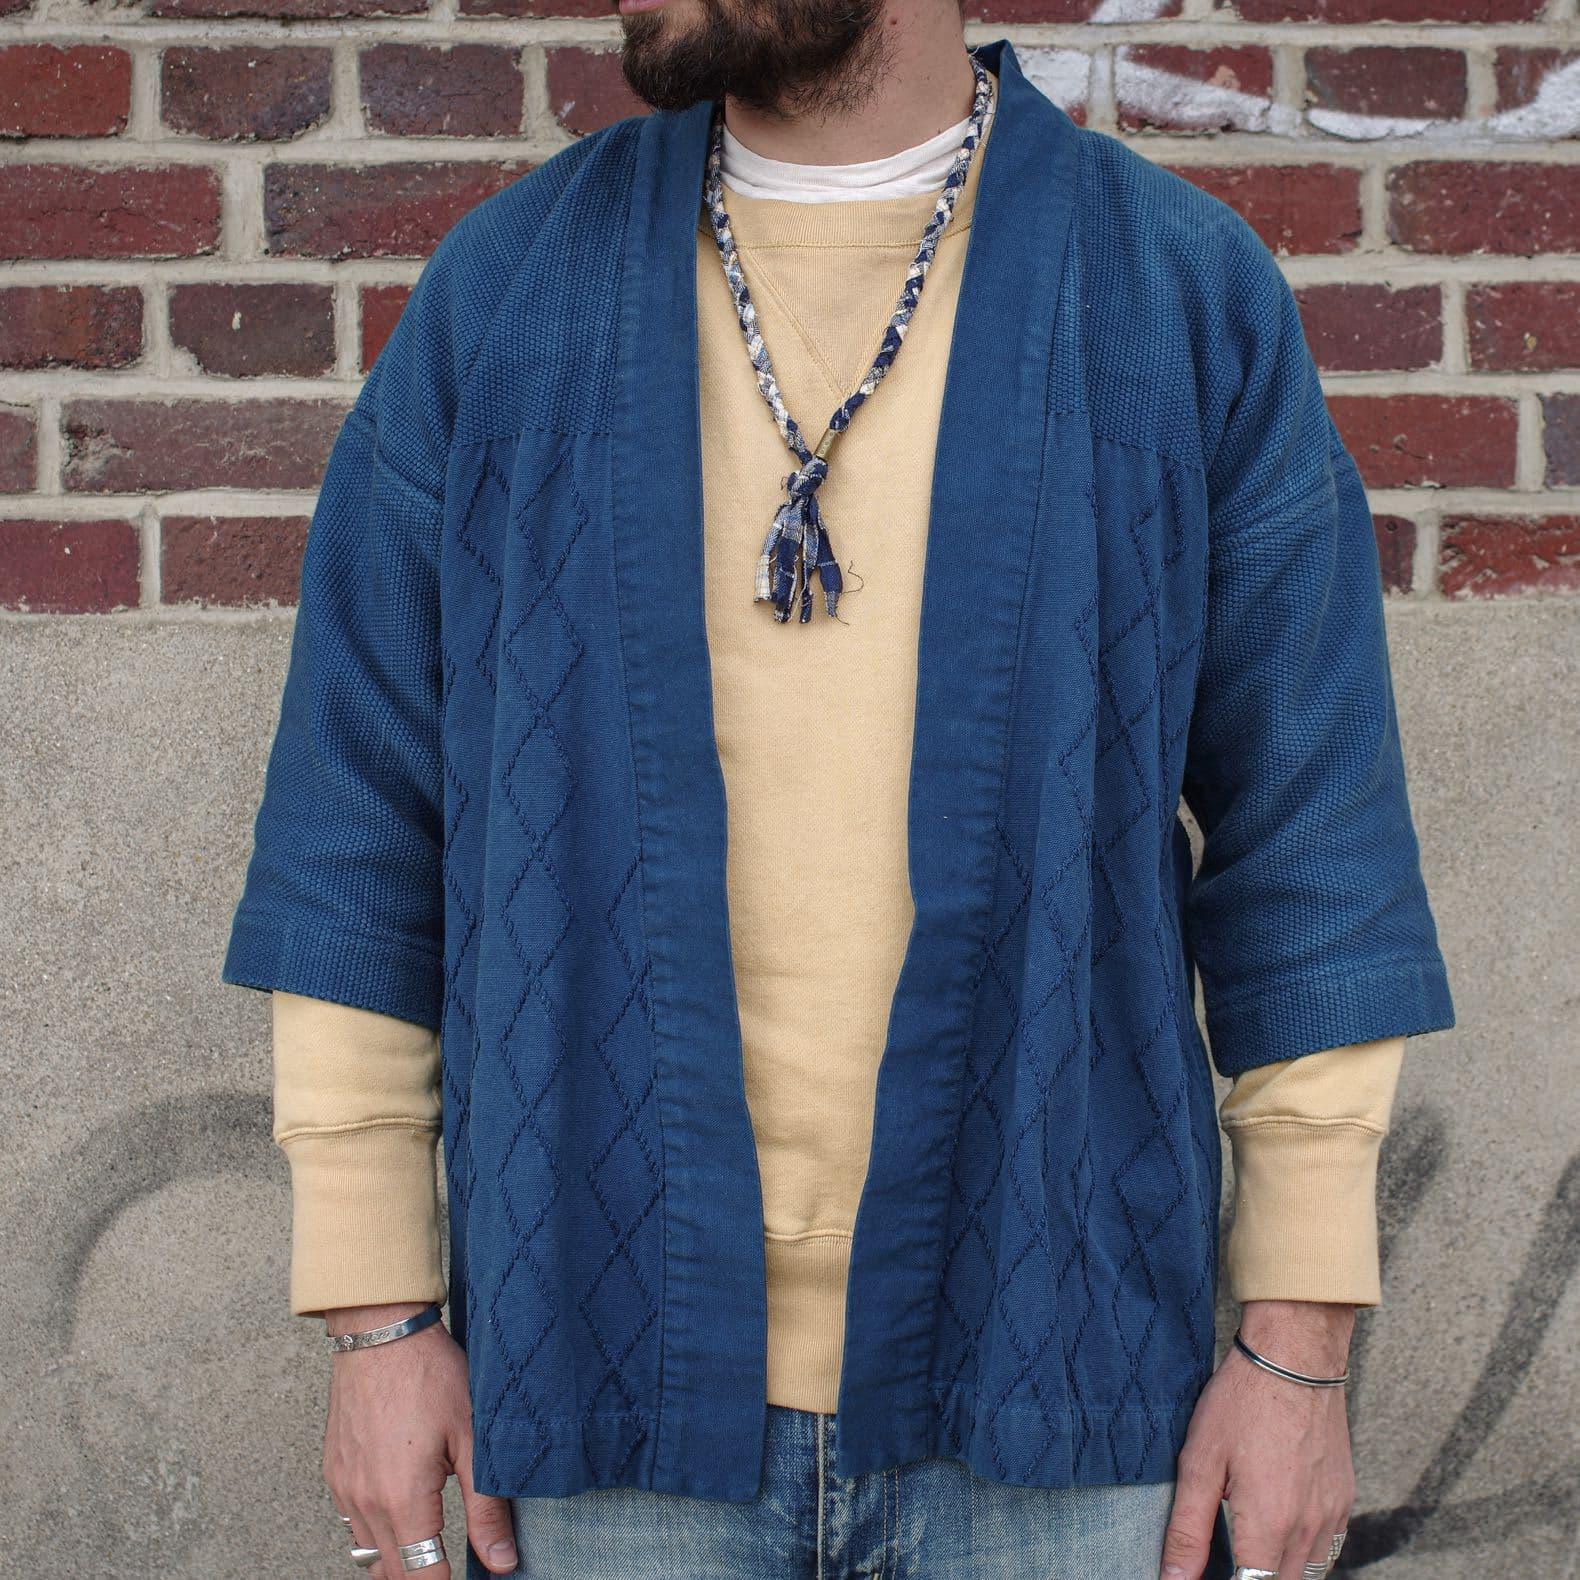 homme qui porte un kimono bleu indigo et un sweat jaune